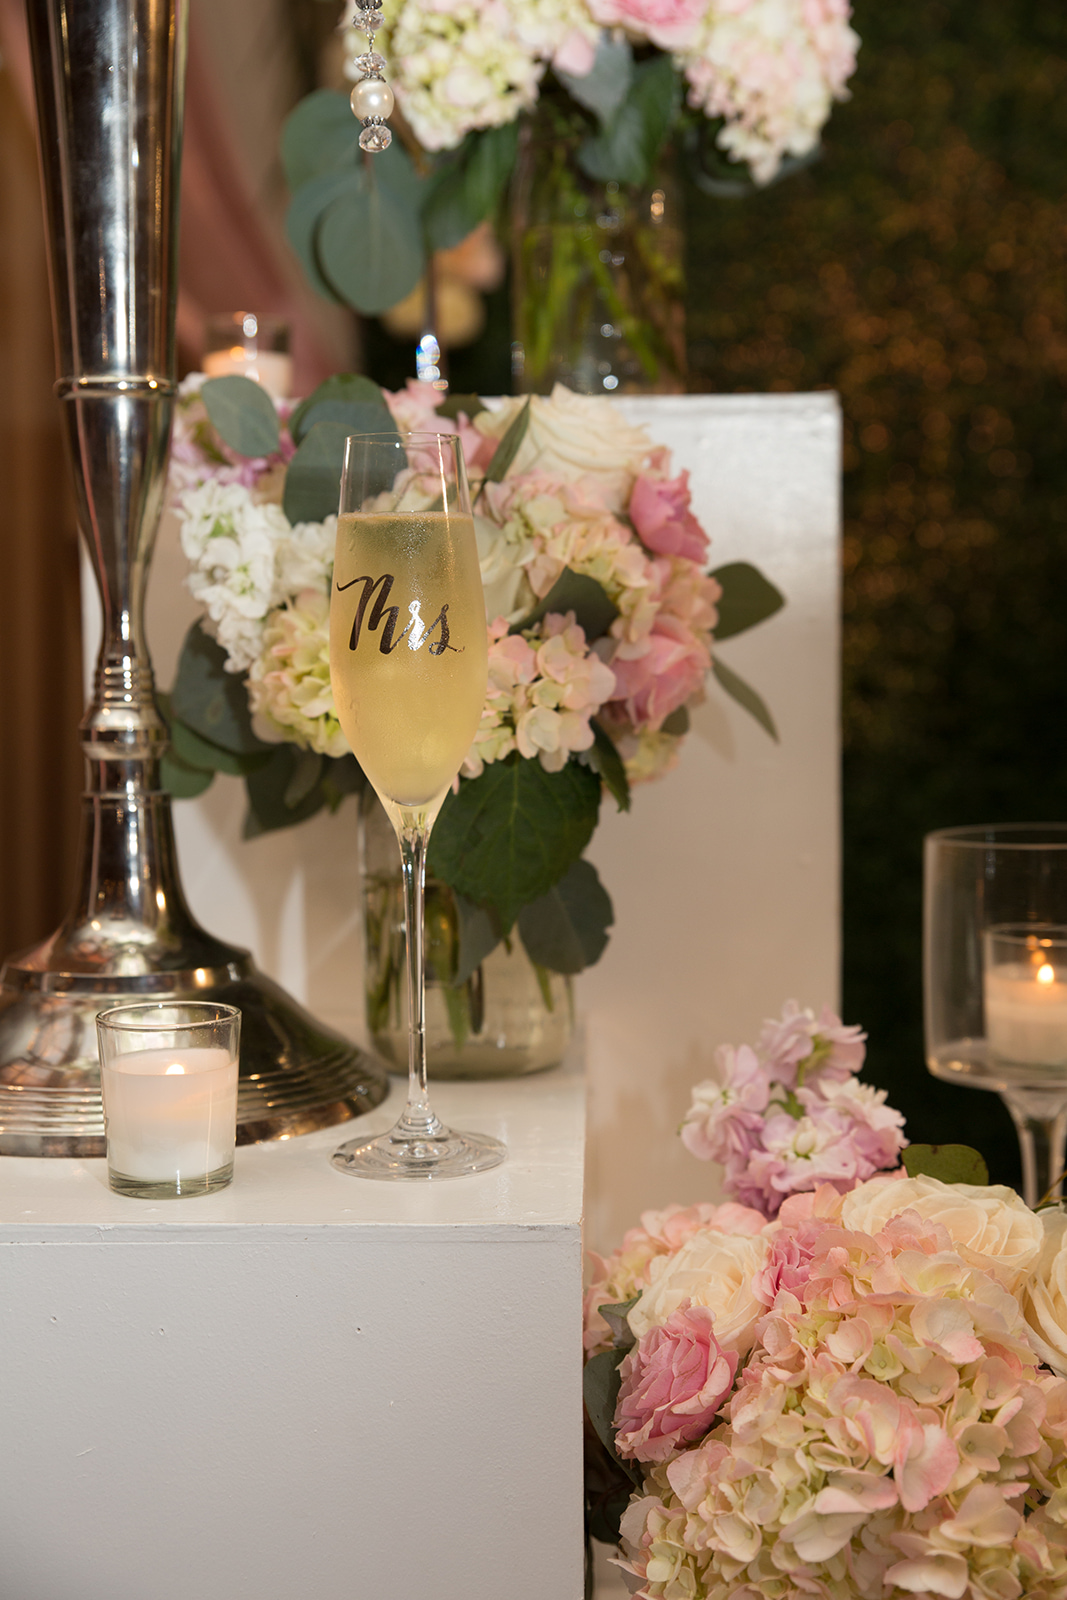 Le Cape Weddings - Sumeet and Chavi - Reception Details  -48.jpg